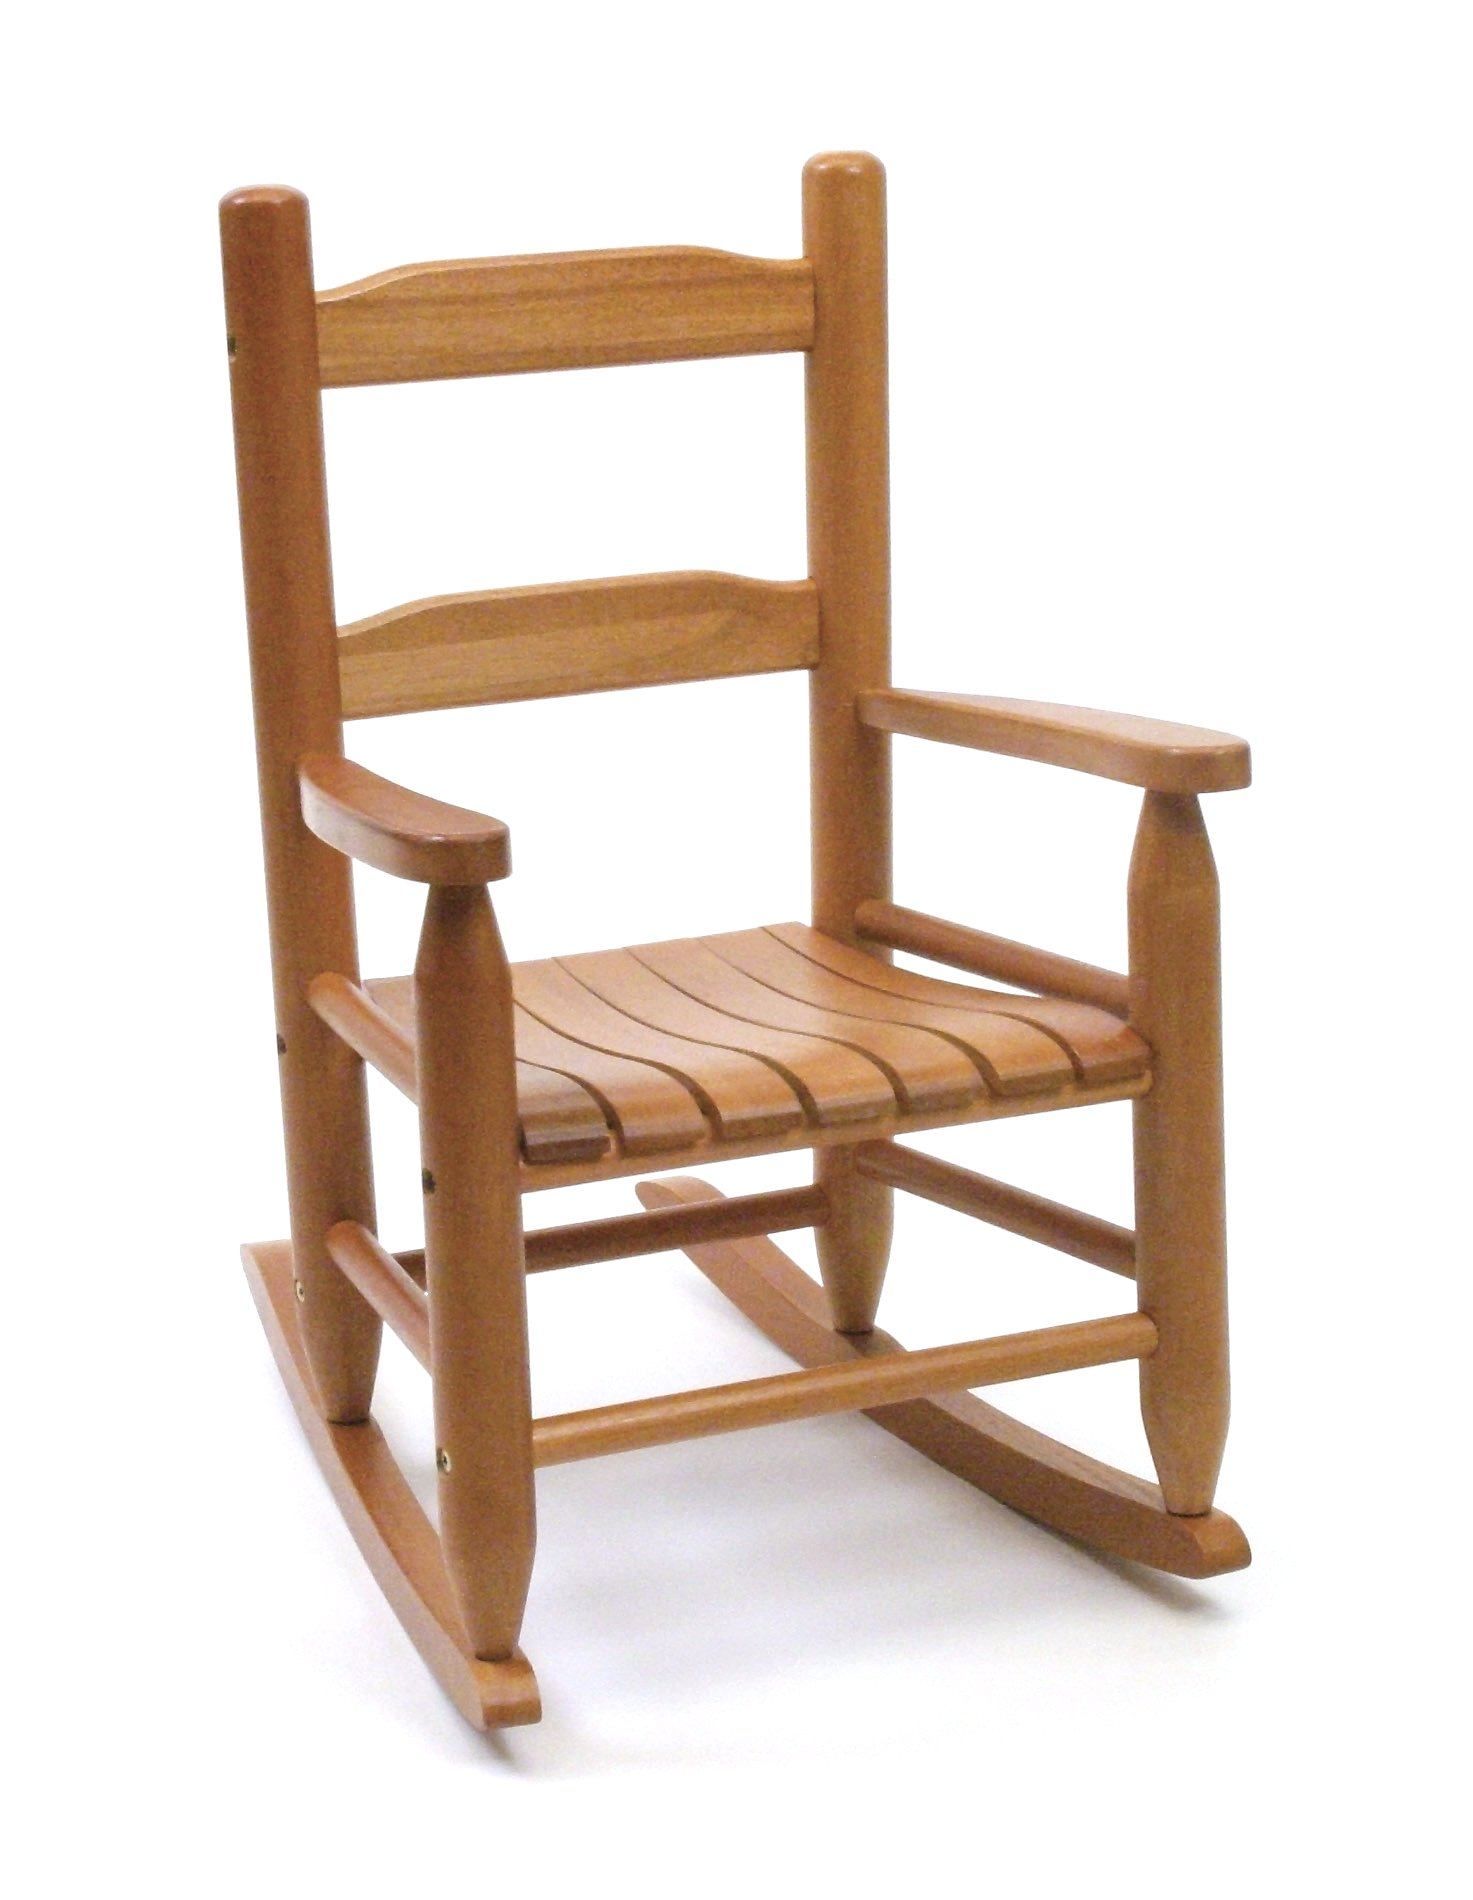 Lipper International 555P Child's Rocking Chair, 14.5'' W x 19.75'' D x 23.75'' H, Pecan Finish